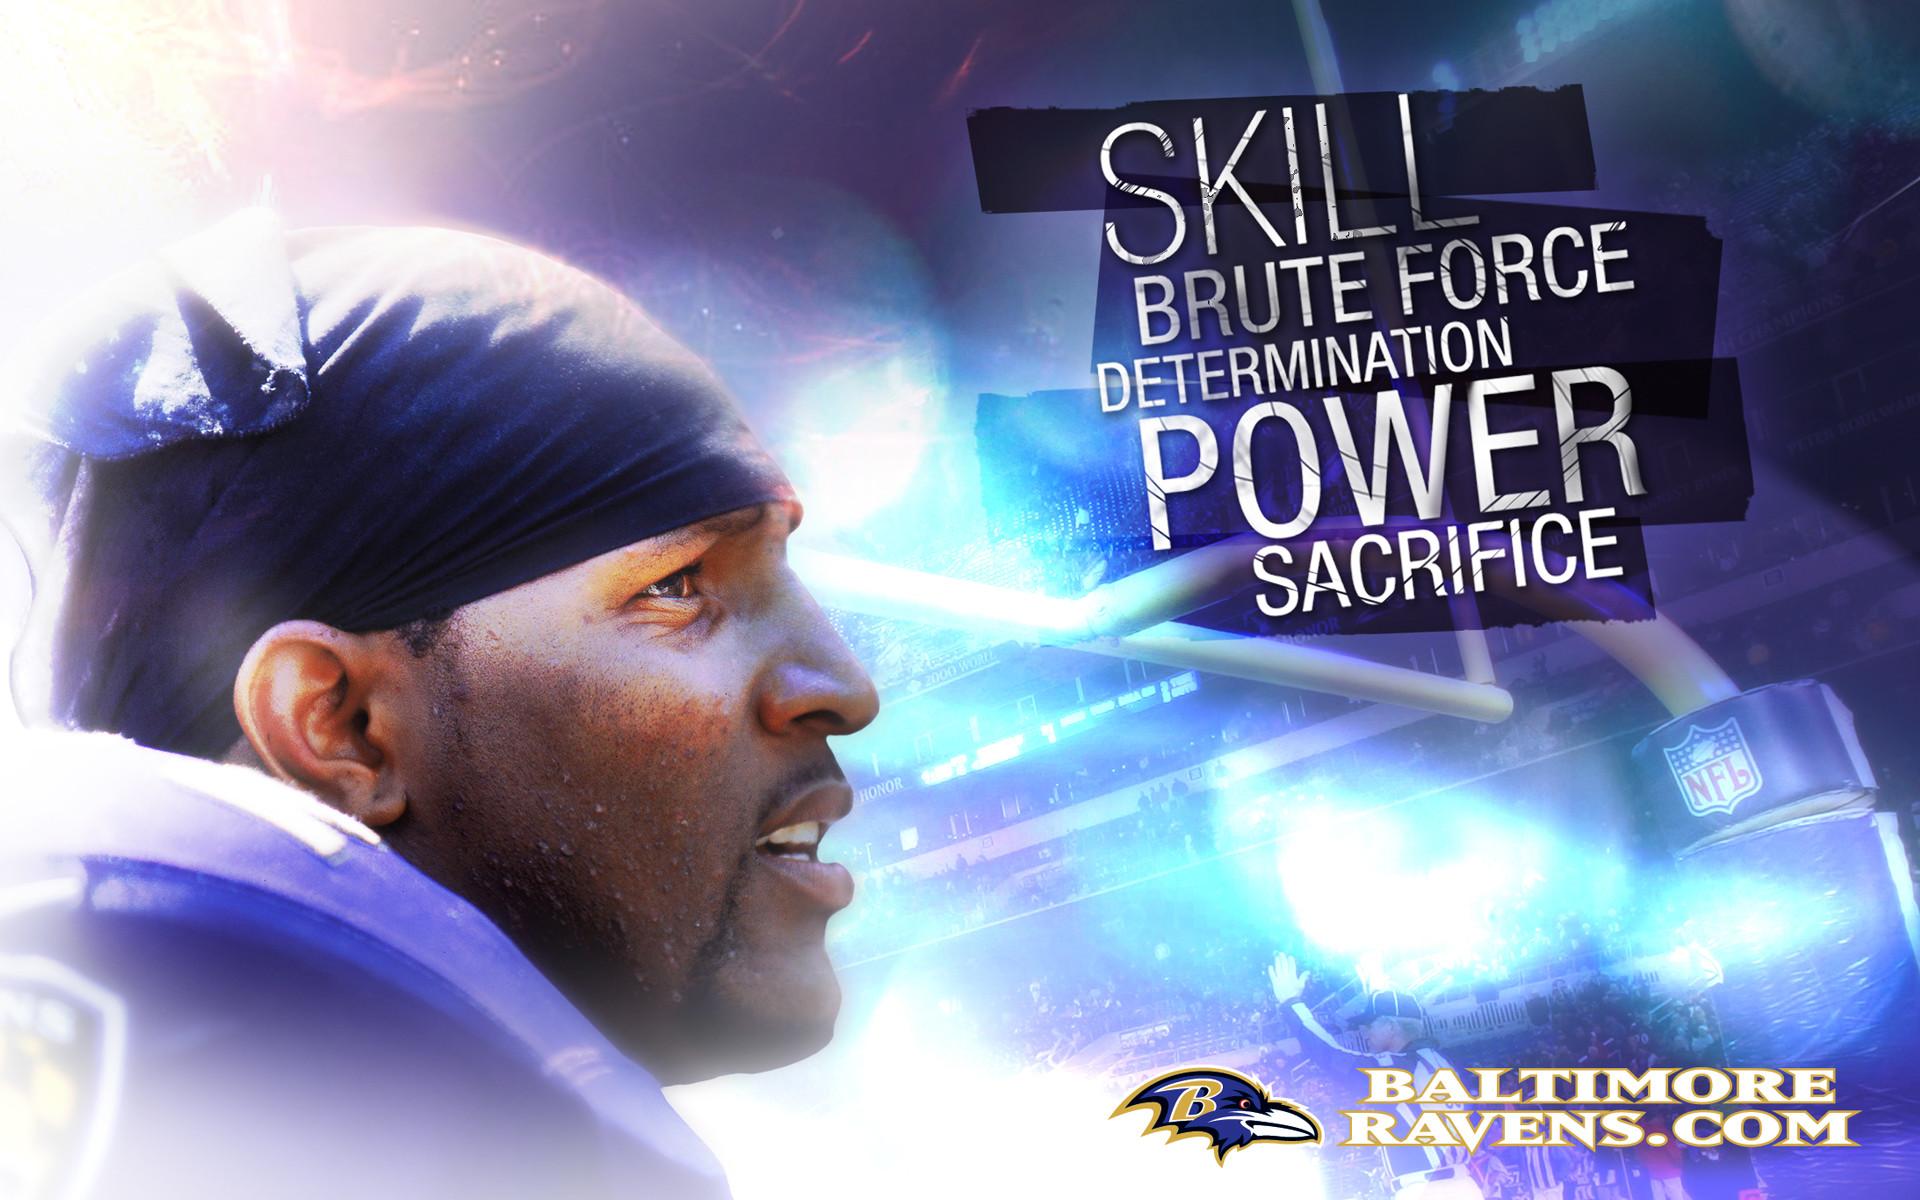 nfl baltimore ravens skill brute force determination power sacrifice